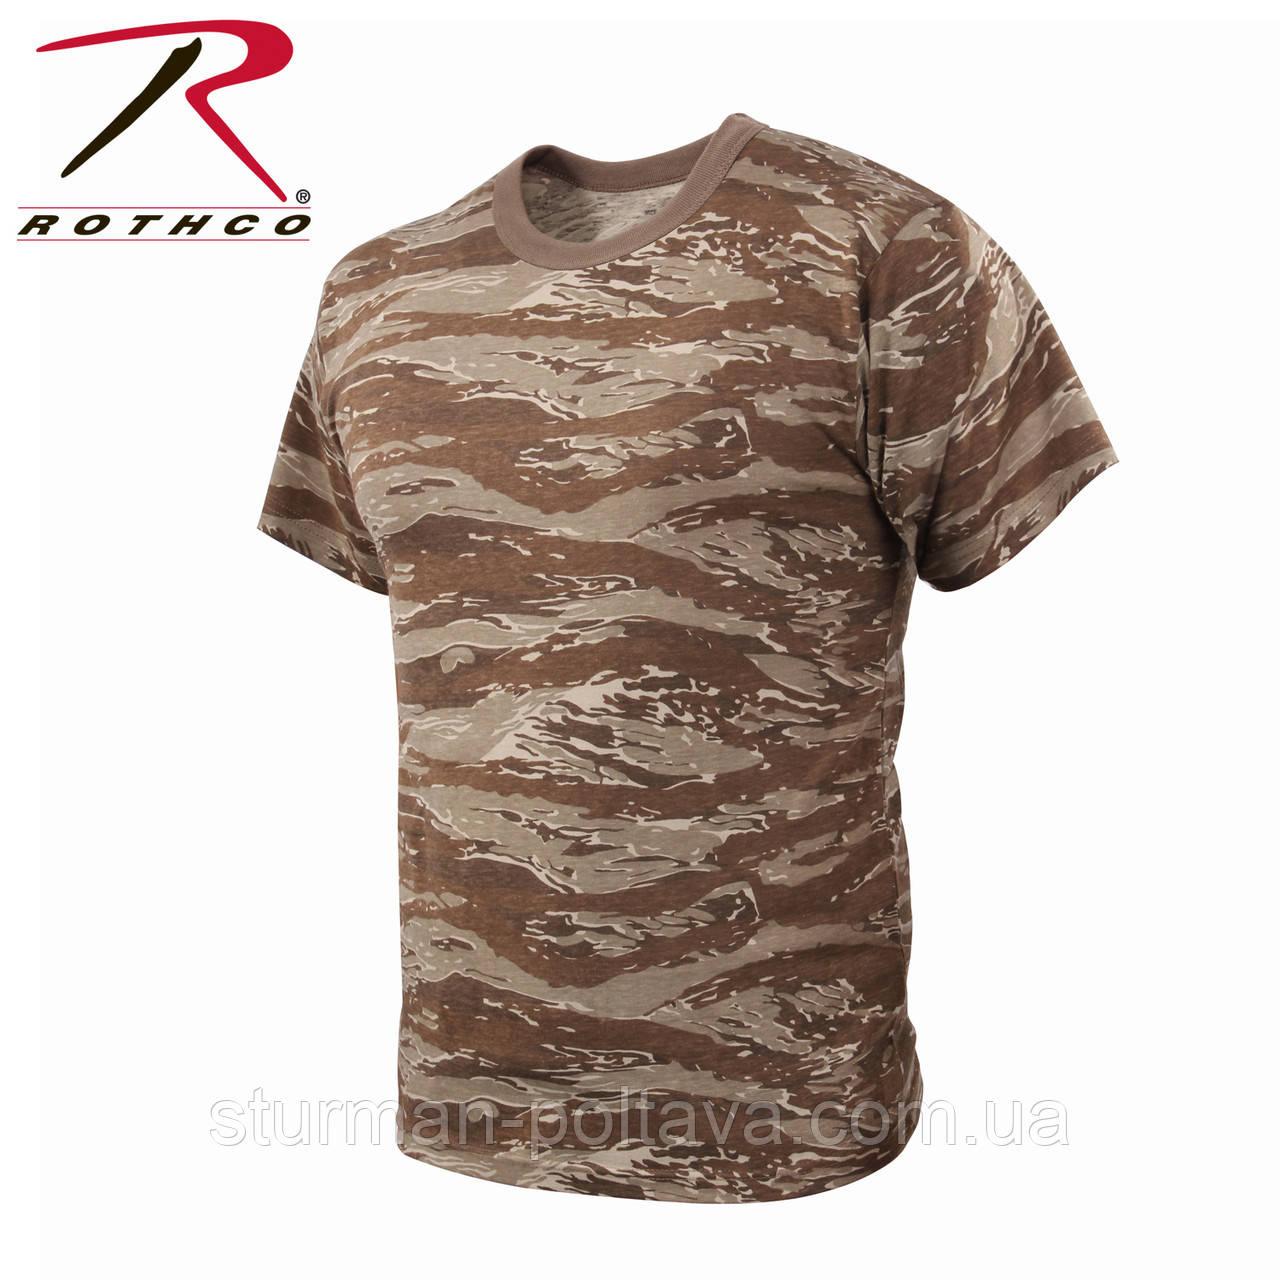 Футболка камуфляжна камуфляж Tiger Desert ROTCHO США